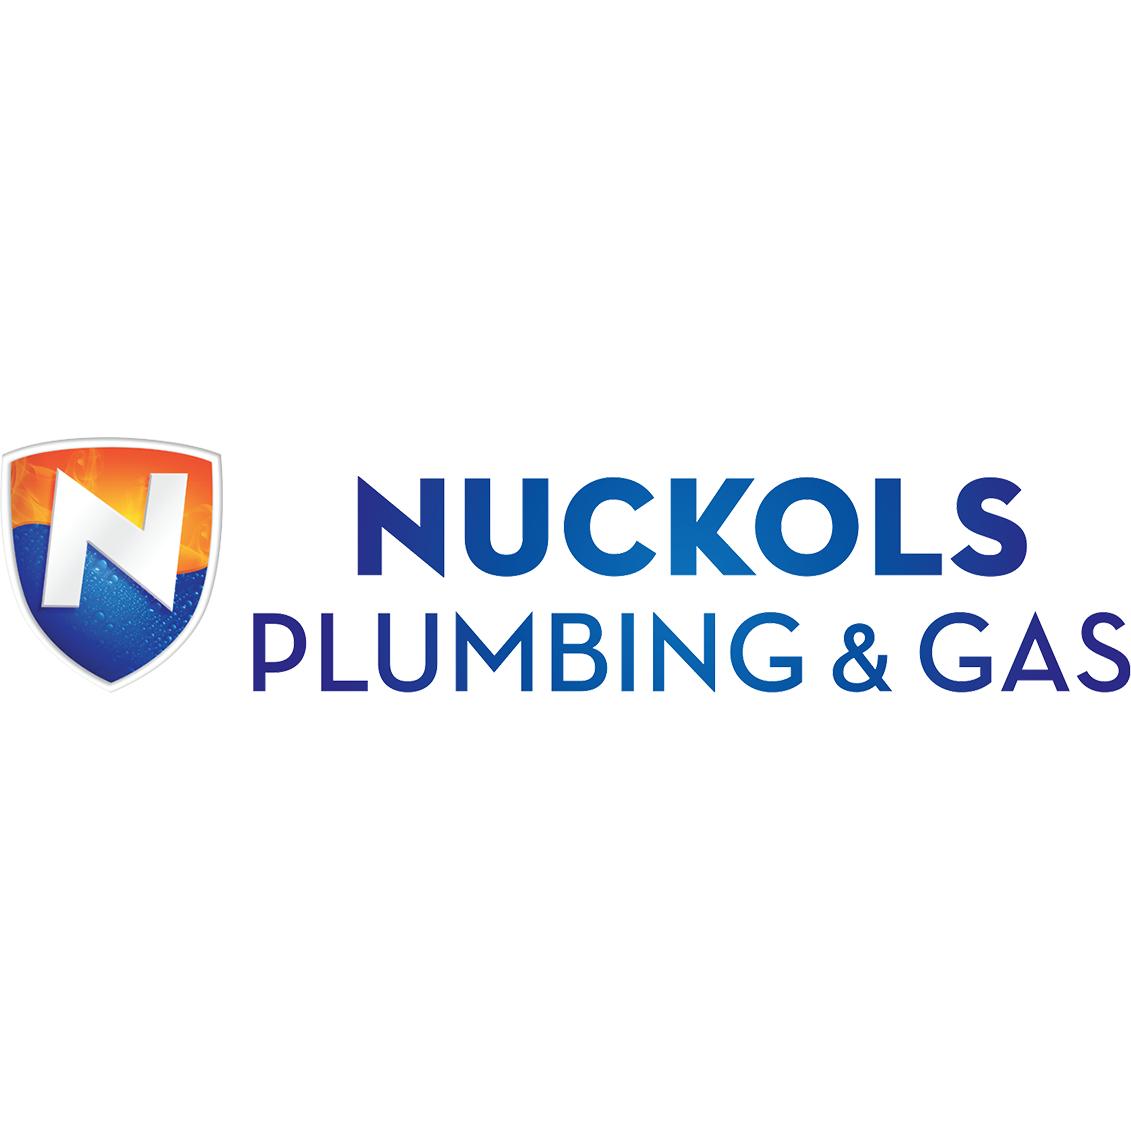 Nuckols Plumbing & Gas, LLC